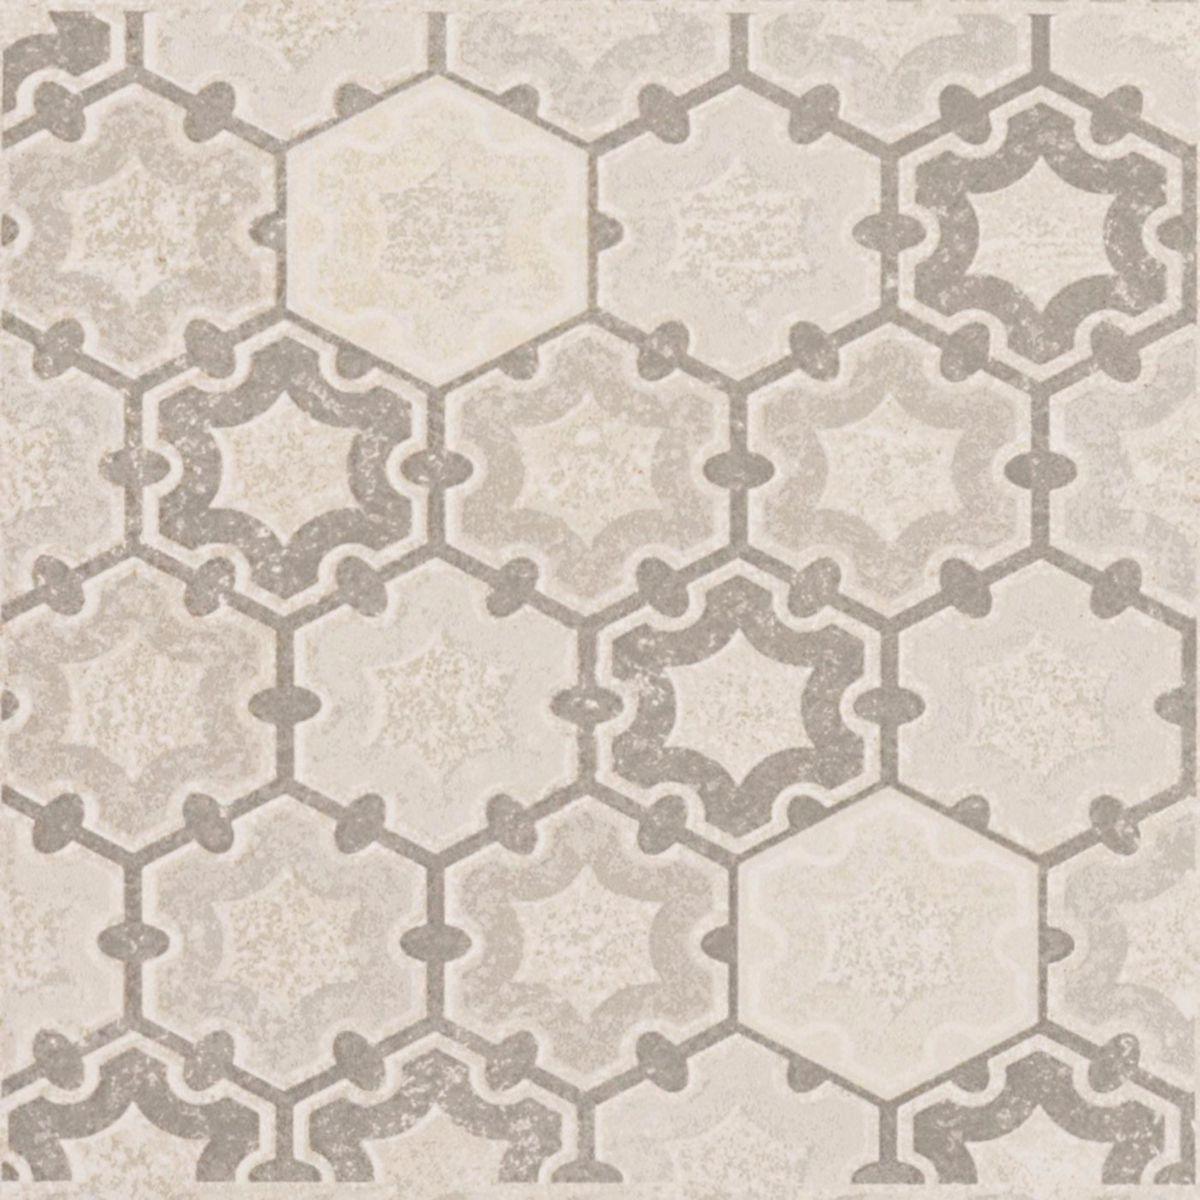 kotto xl deko texture